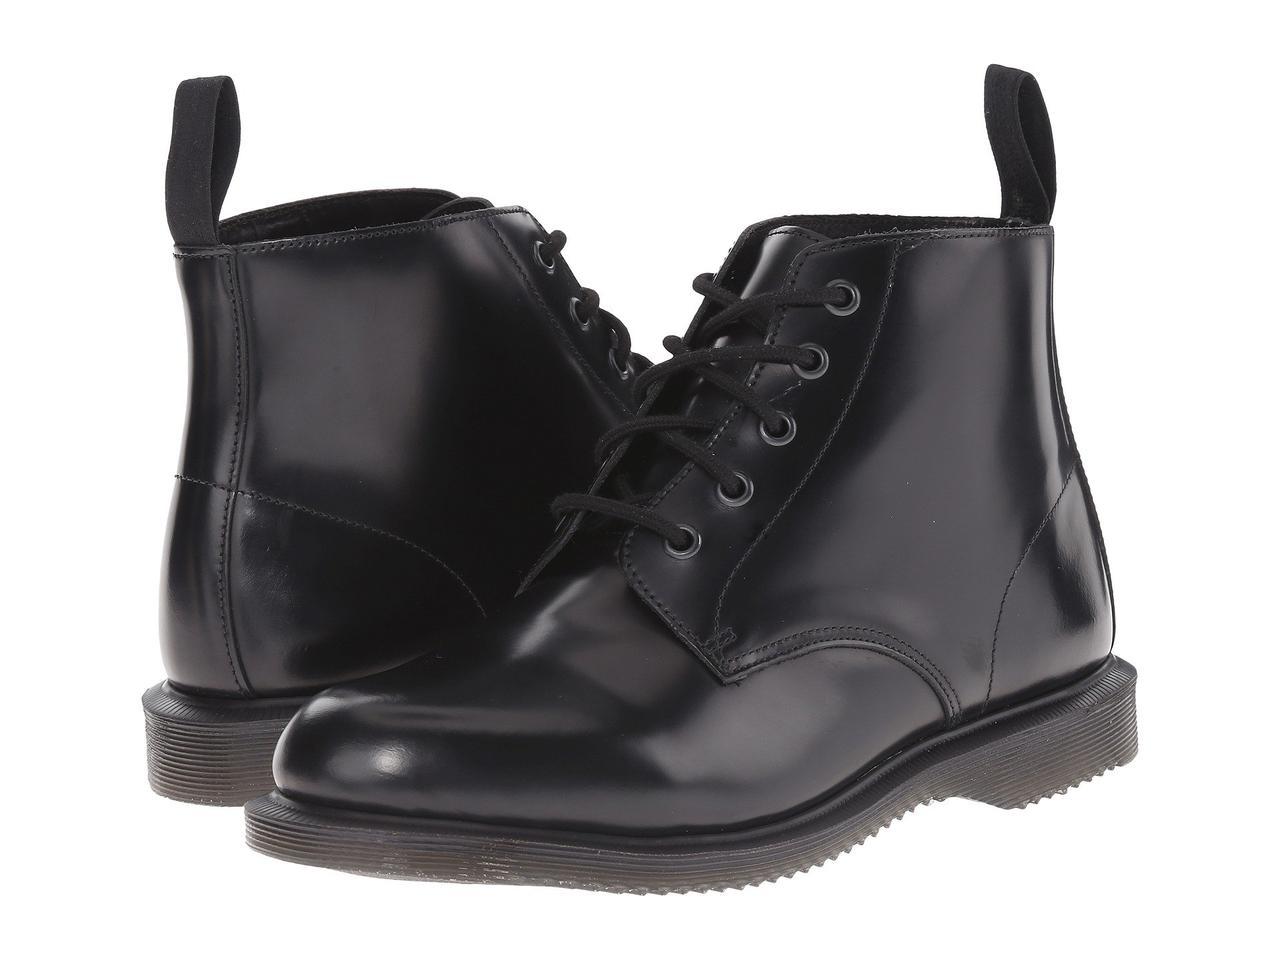 Ботинки Сапоги (Оригинал) Dr. Martens Emmeline Black Polished Smooth -  TopUSA